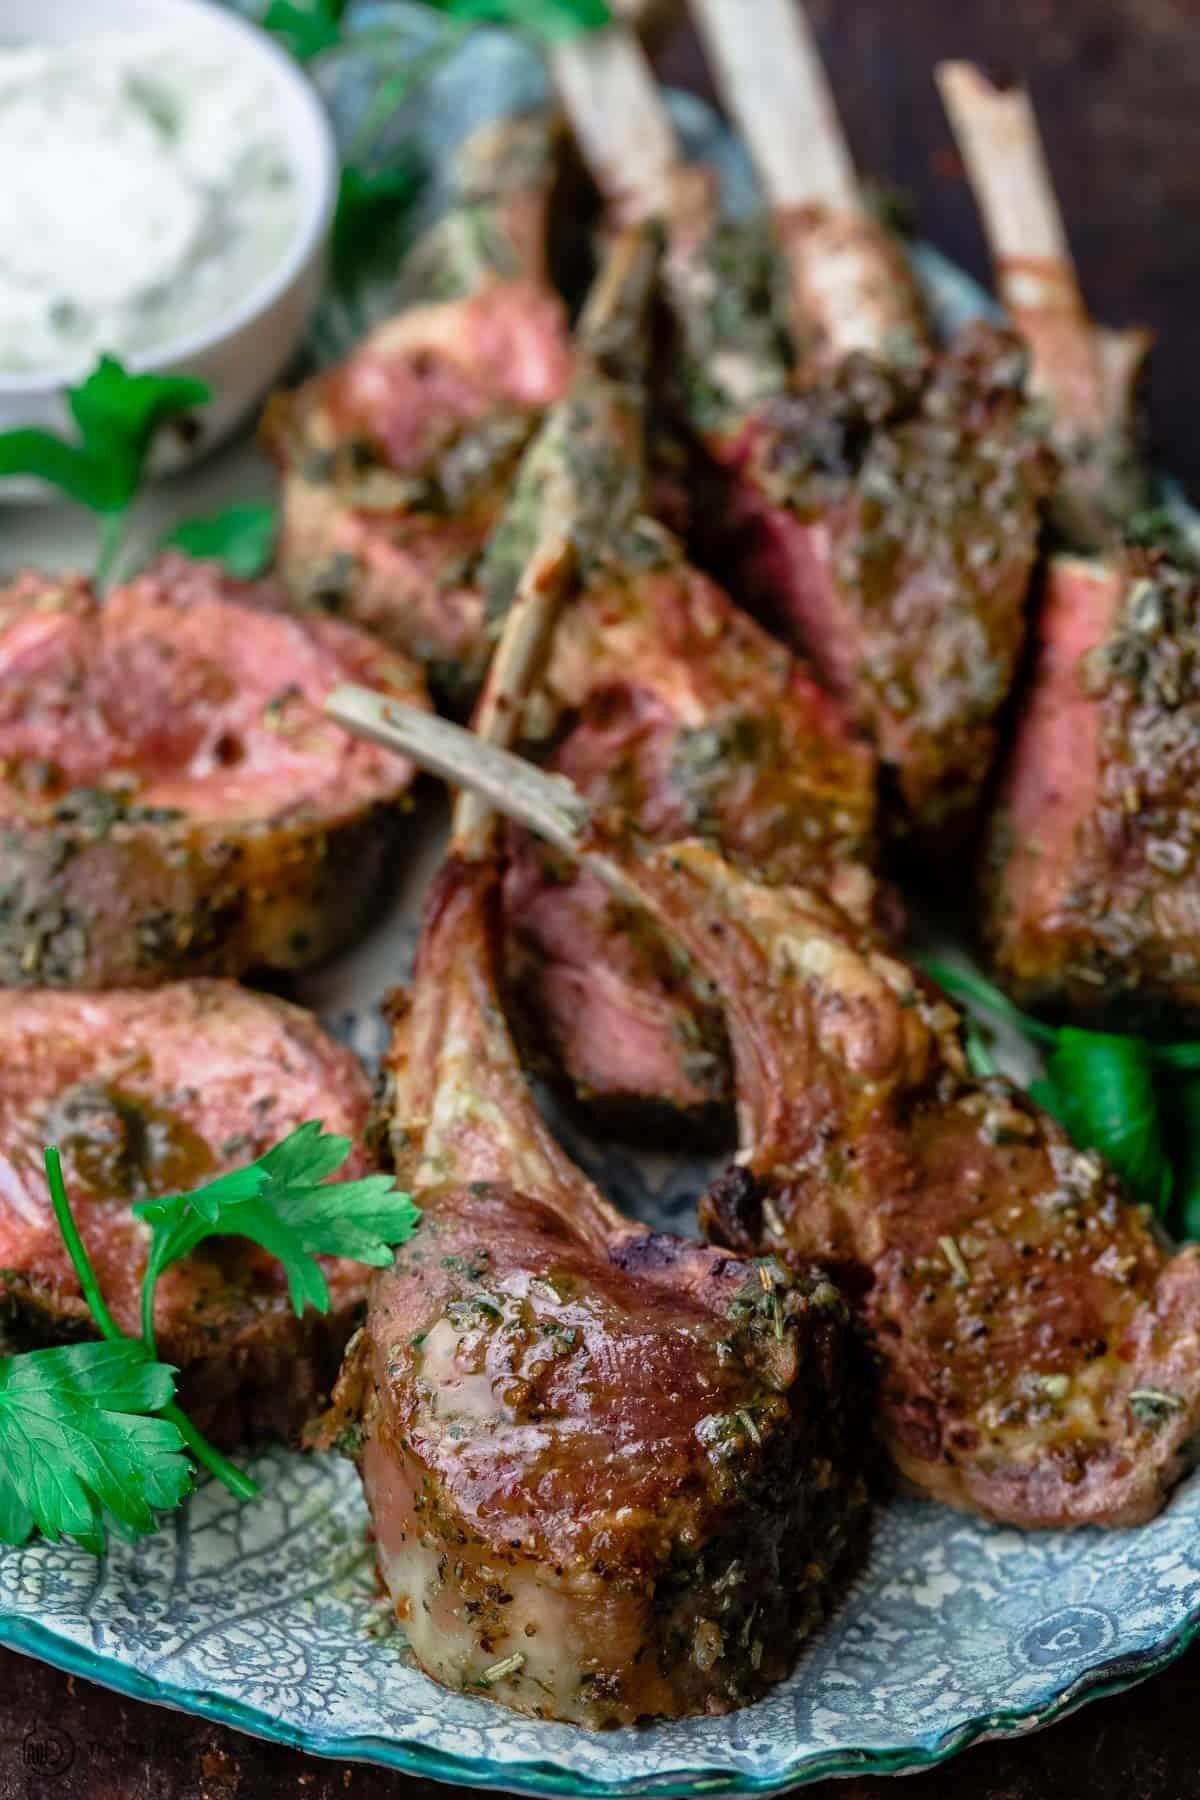 Roasted lamb chops on a serving platter.